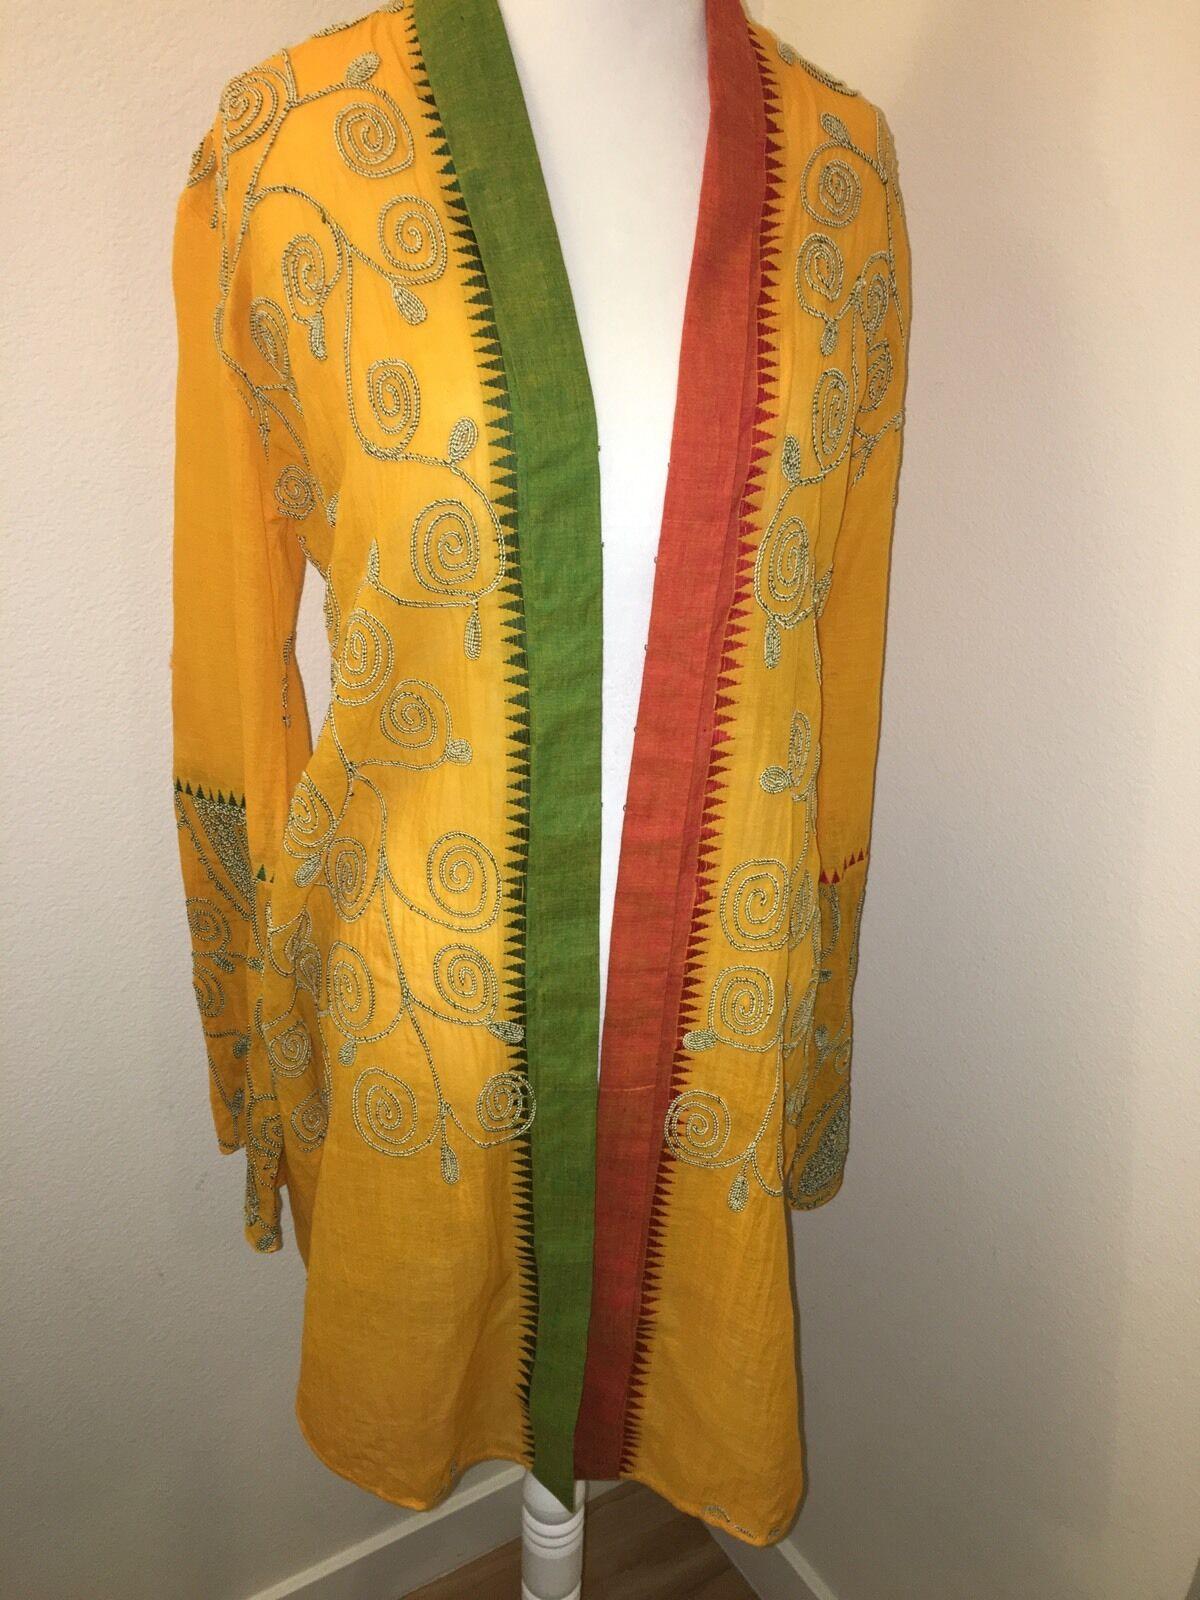 Paul Ropp Embroidered Beach Kimono Cover Up S Small Gypsy Cape Yellow orange